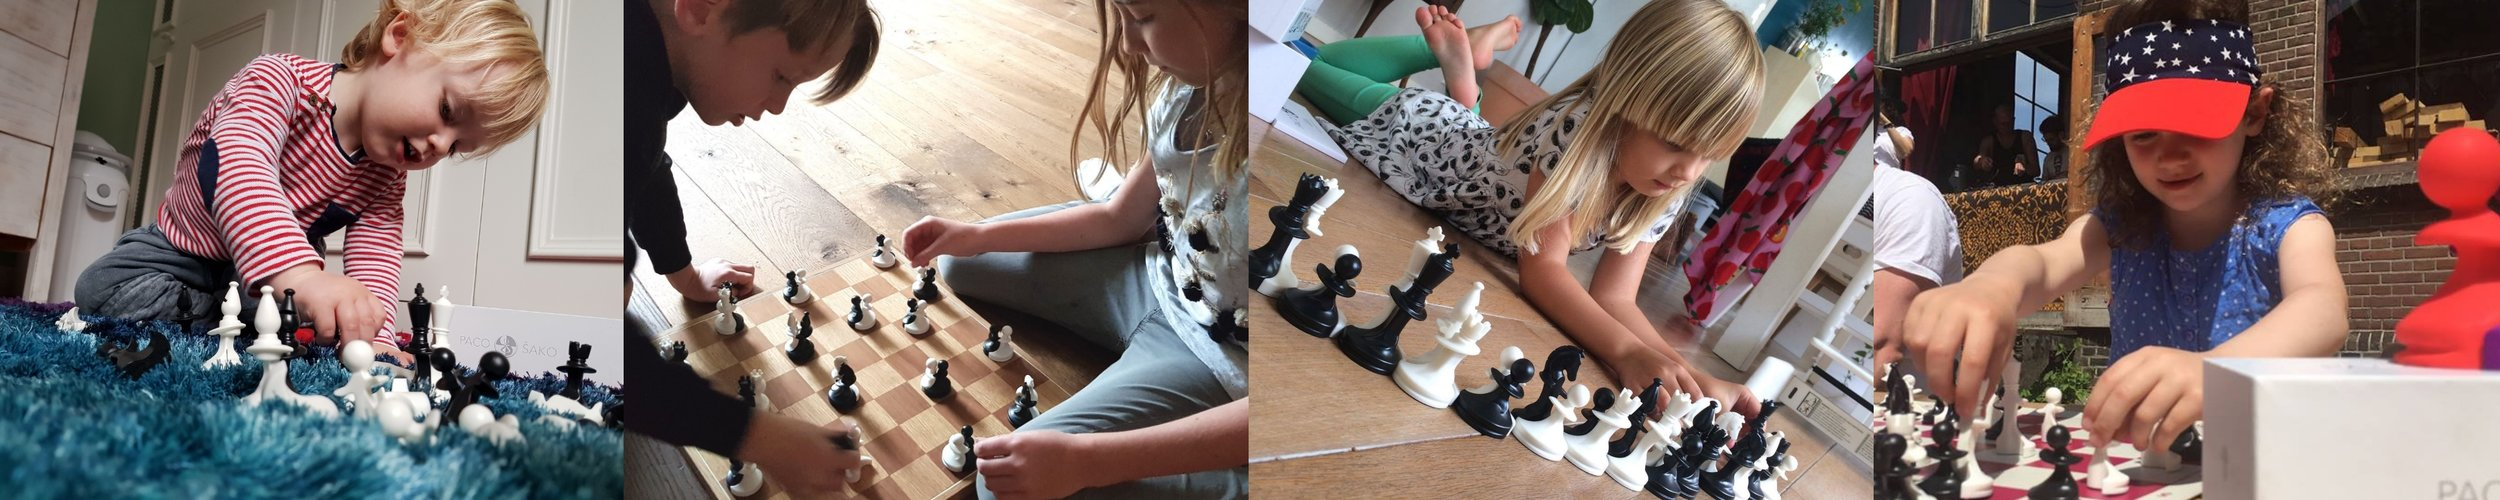 Kids uniting Pieces.jpg